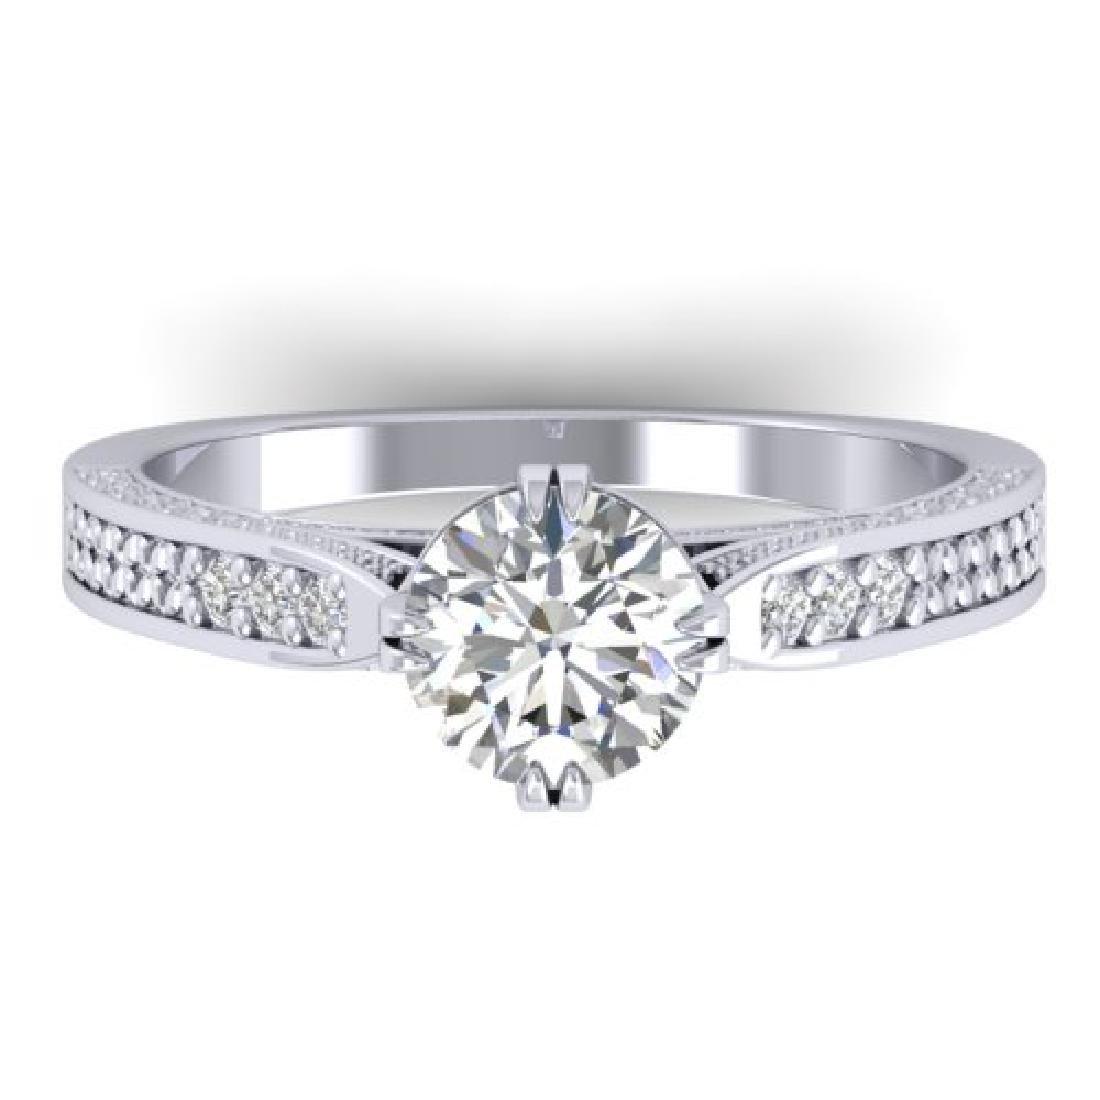 1.22 CTW Certified VS/SI Diamond Solitaire Art Deco